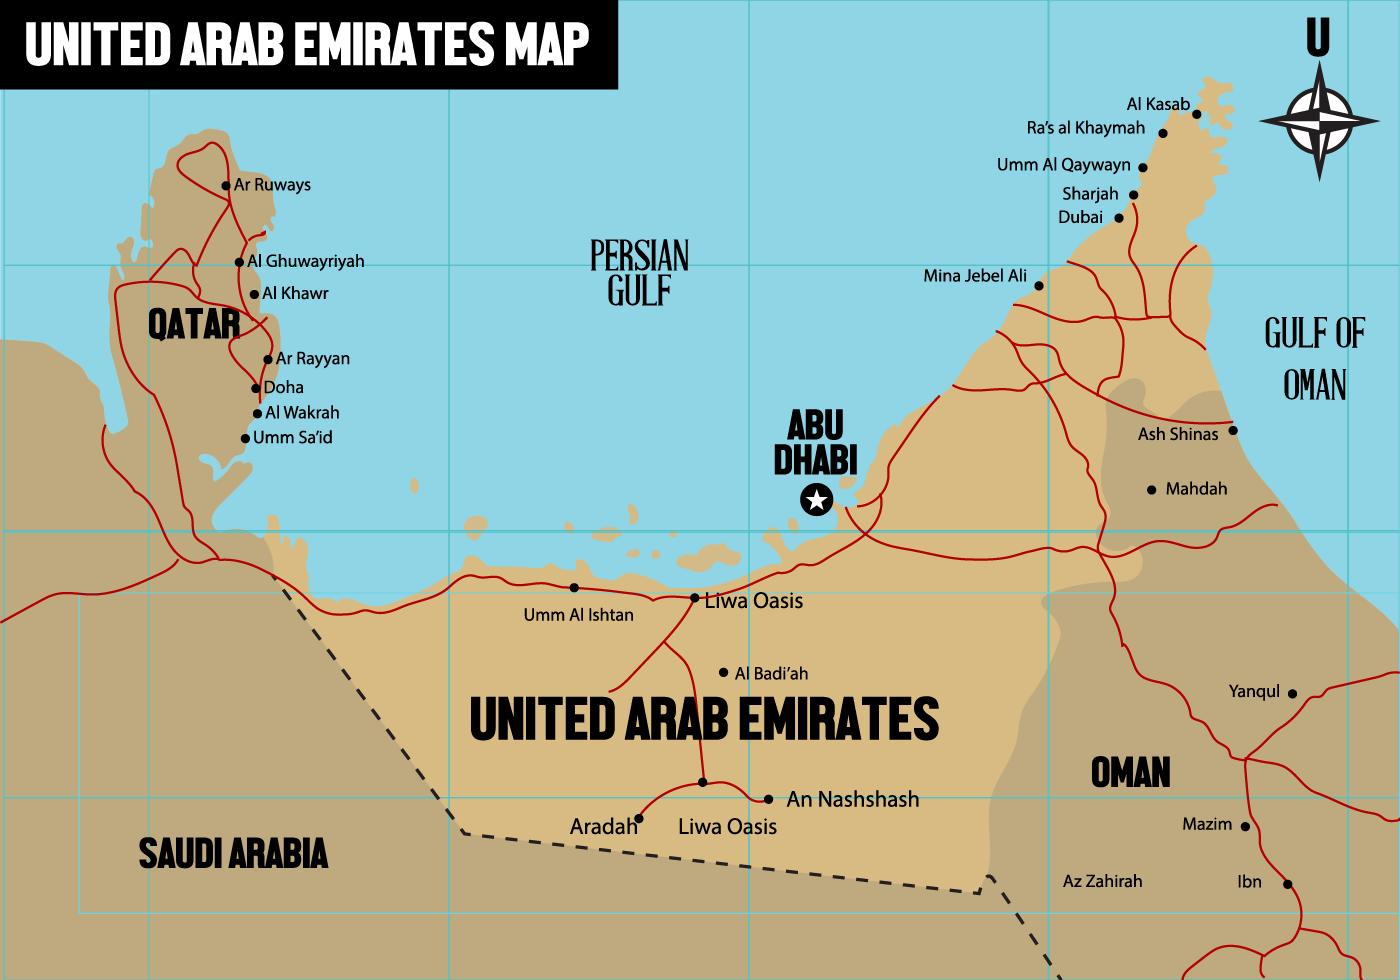 United Arab Emirates Vector 3D Map Download Free Vector Art – Map of Dubai United Arab Emirates